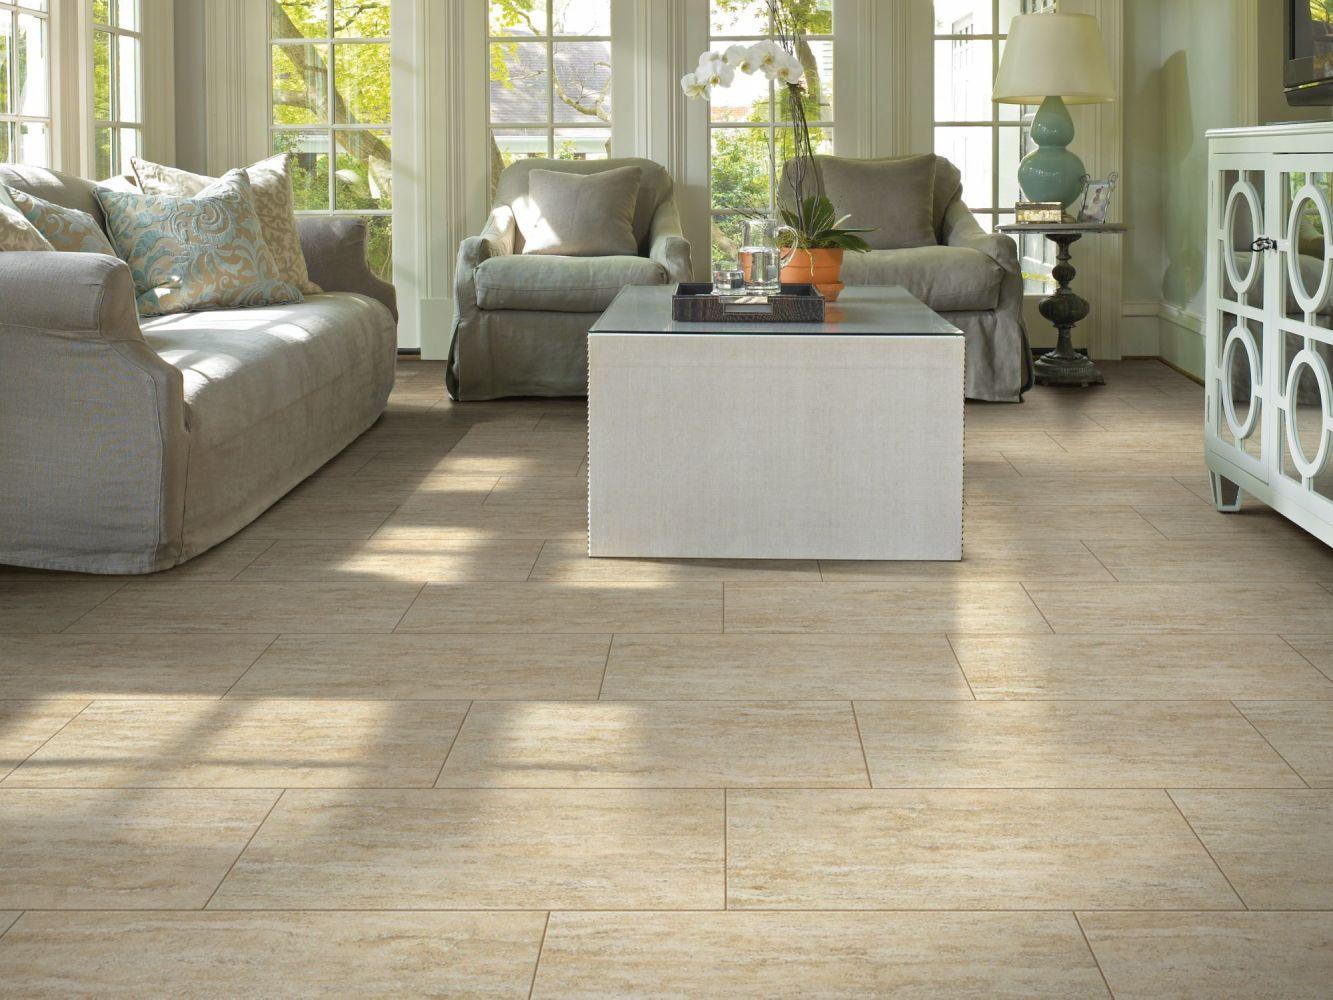 Shaw Floors Home Fn Gold Ceramic Travertino 13×13 Beige 00200_TGH13